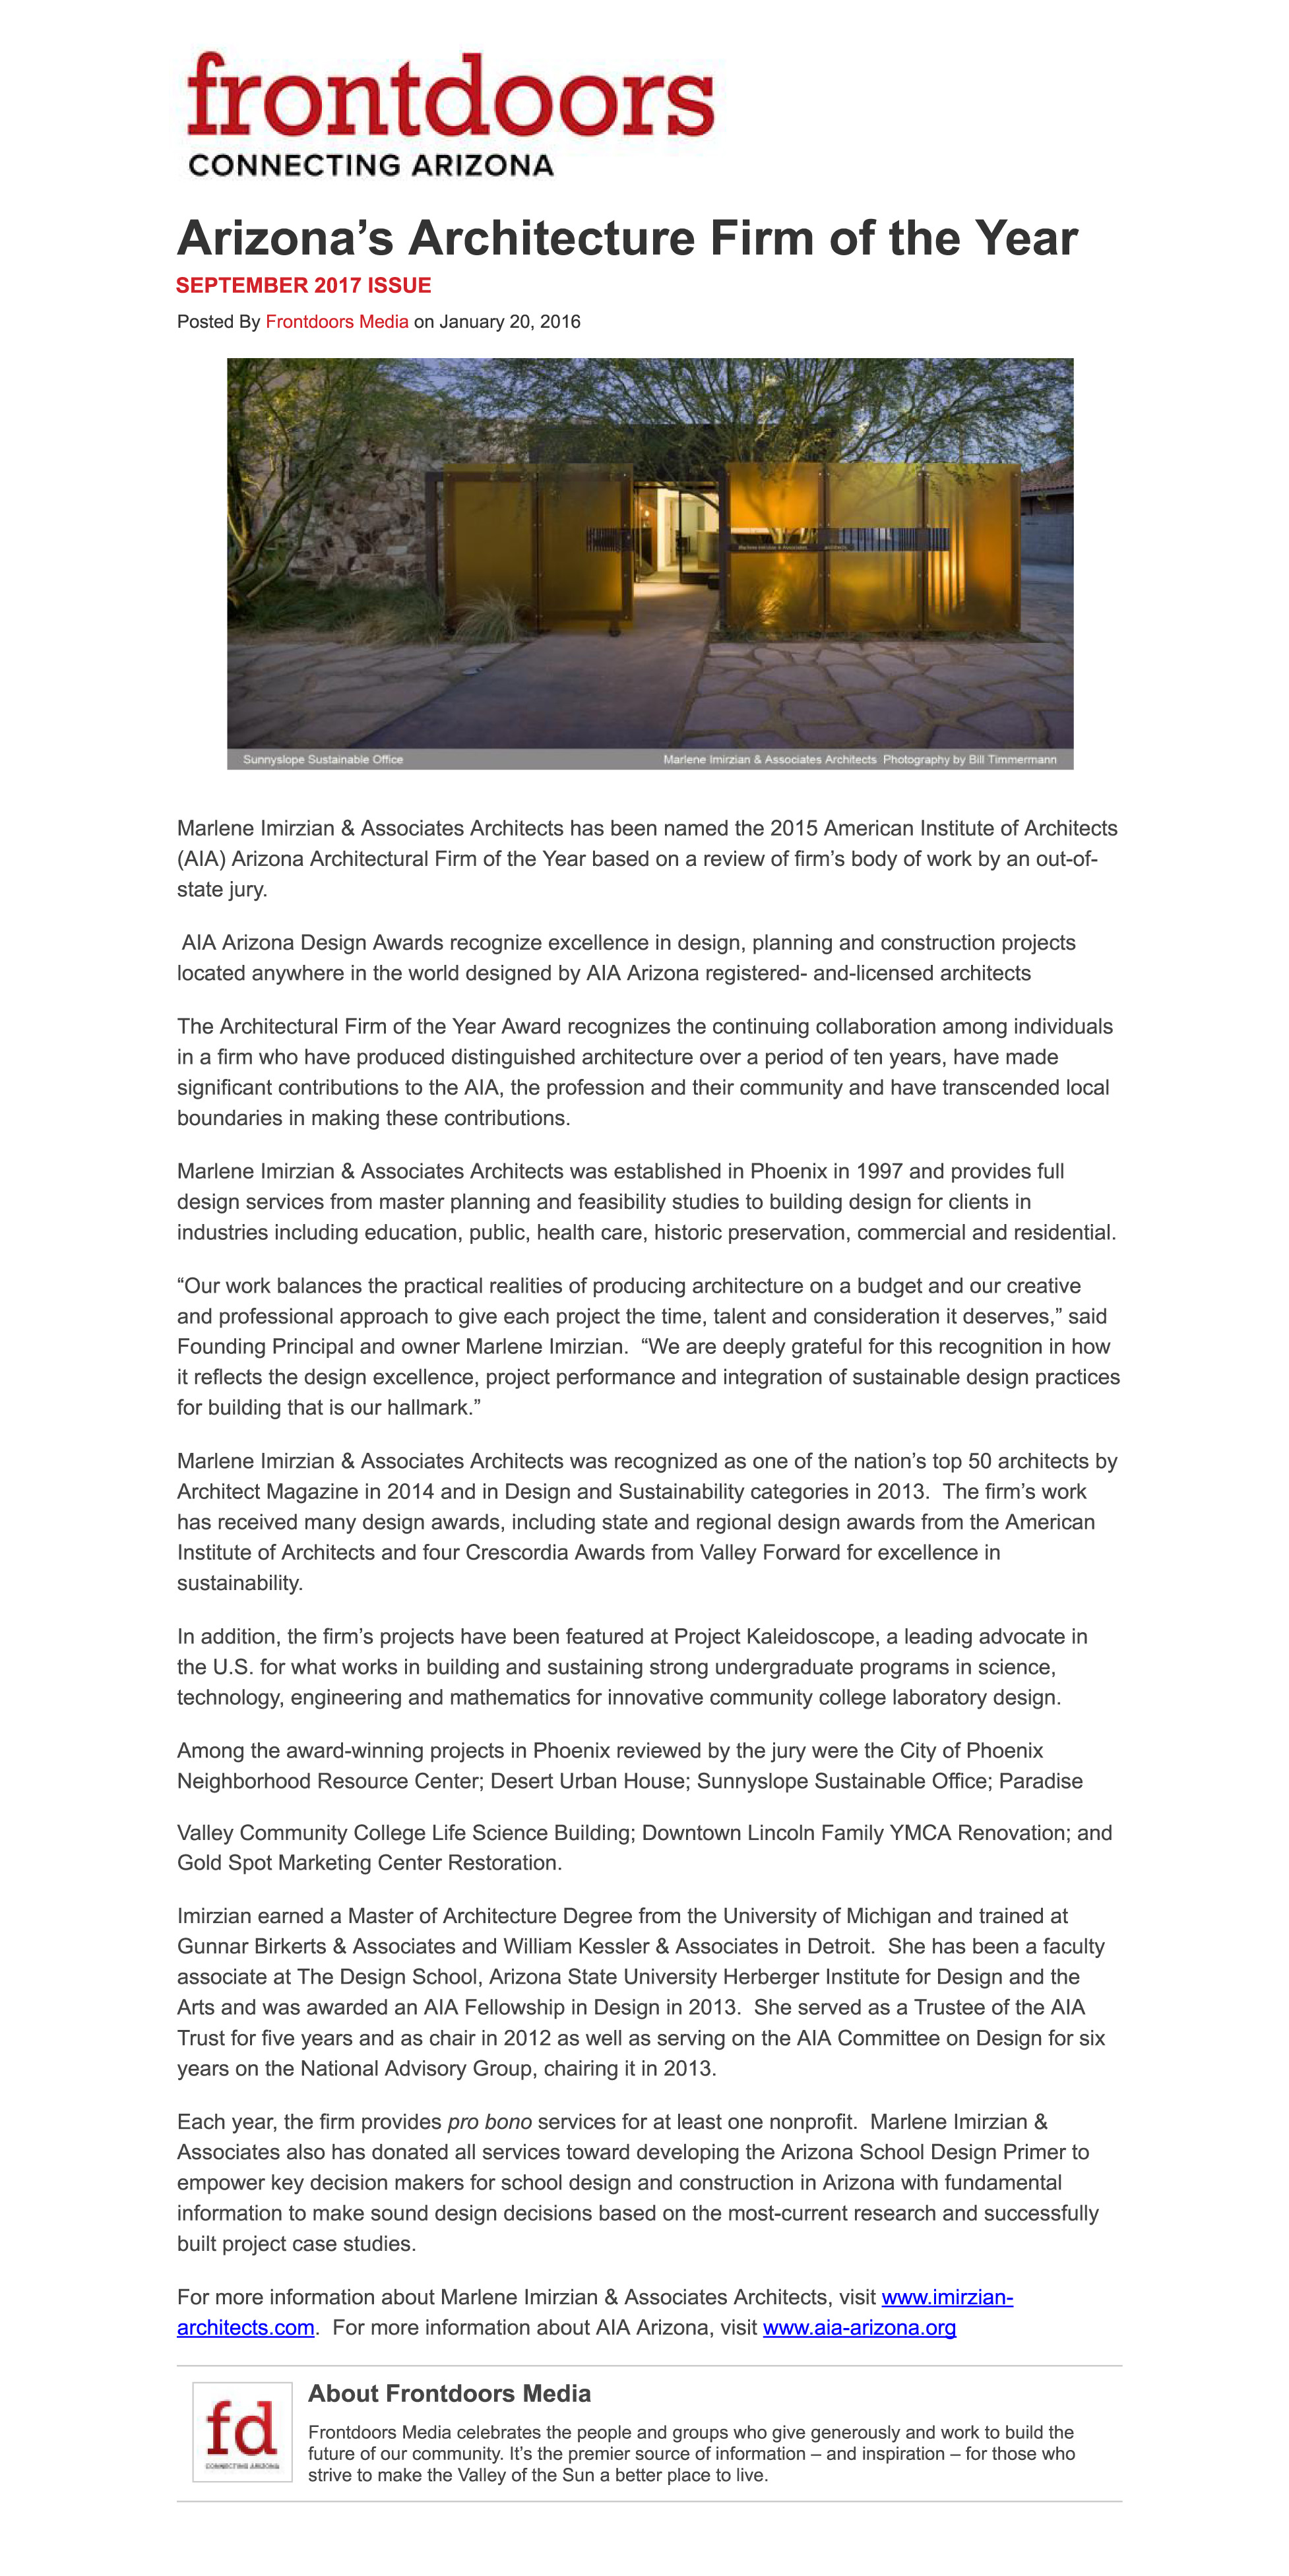 Imirzian Architects | Frontdoors News: Arizona's